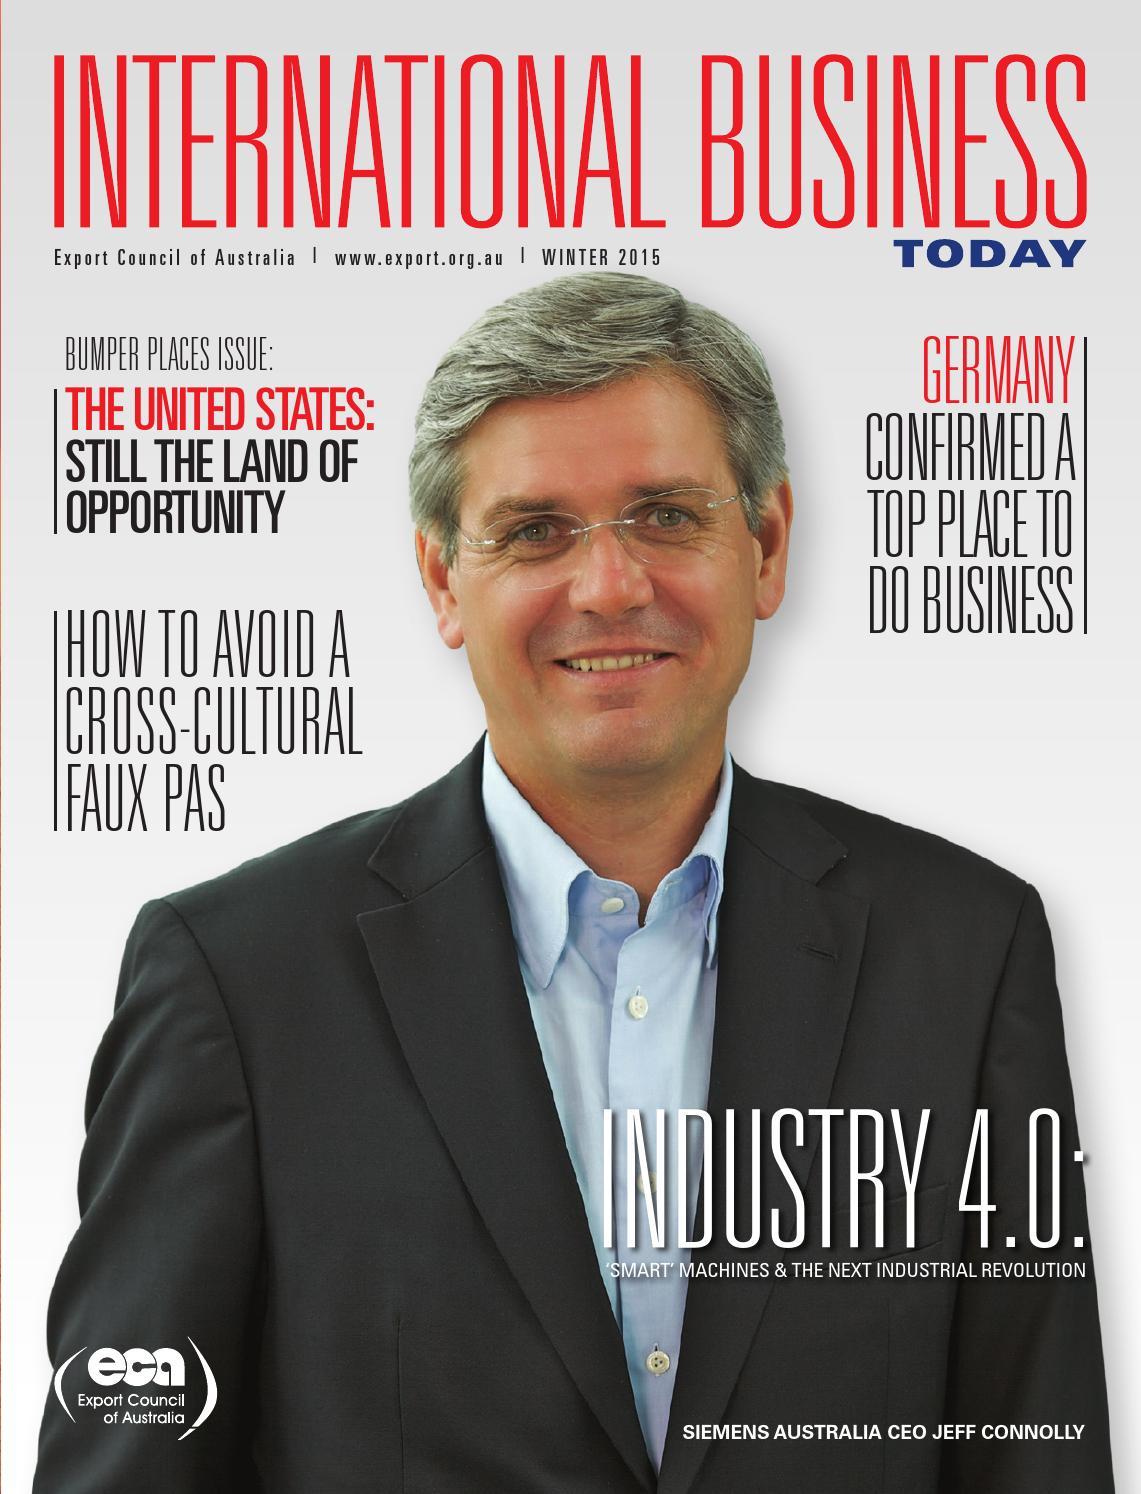 2015 Eca International Business Today Winterarkmedia4217